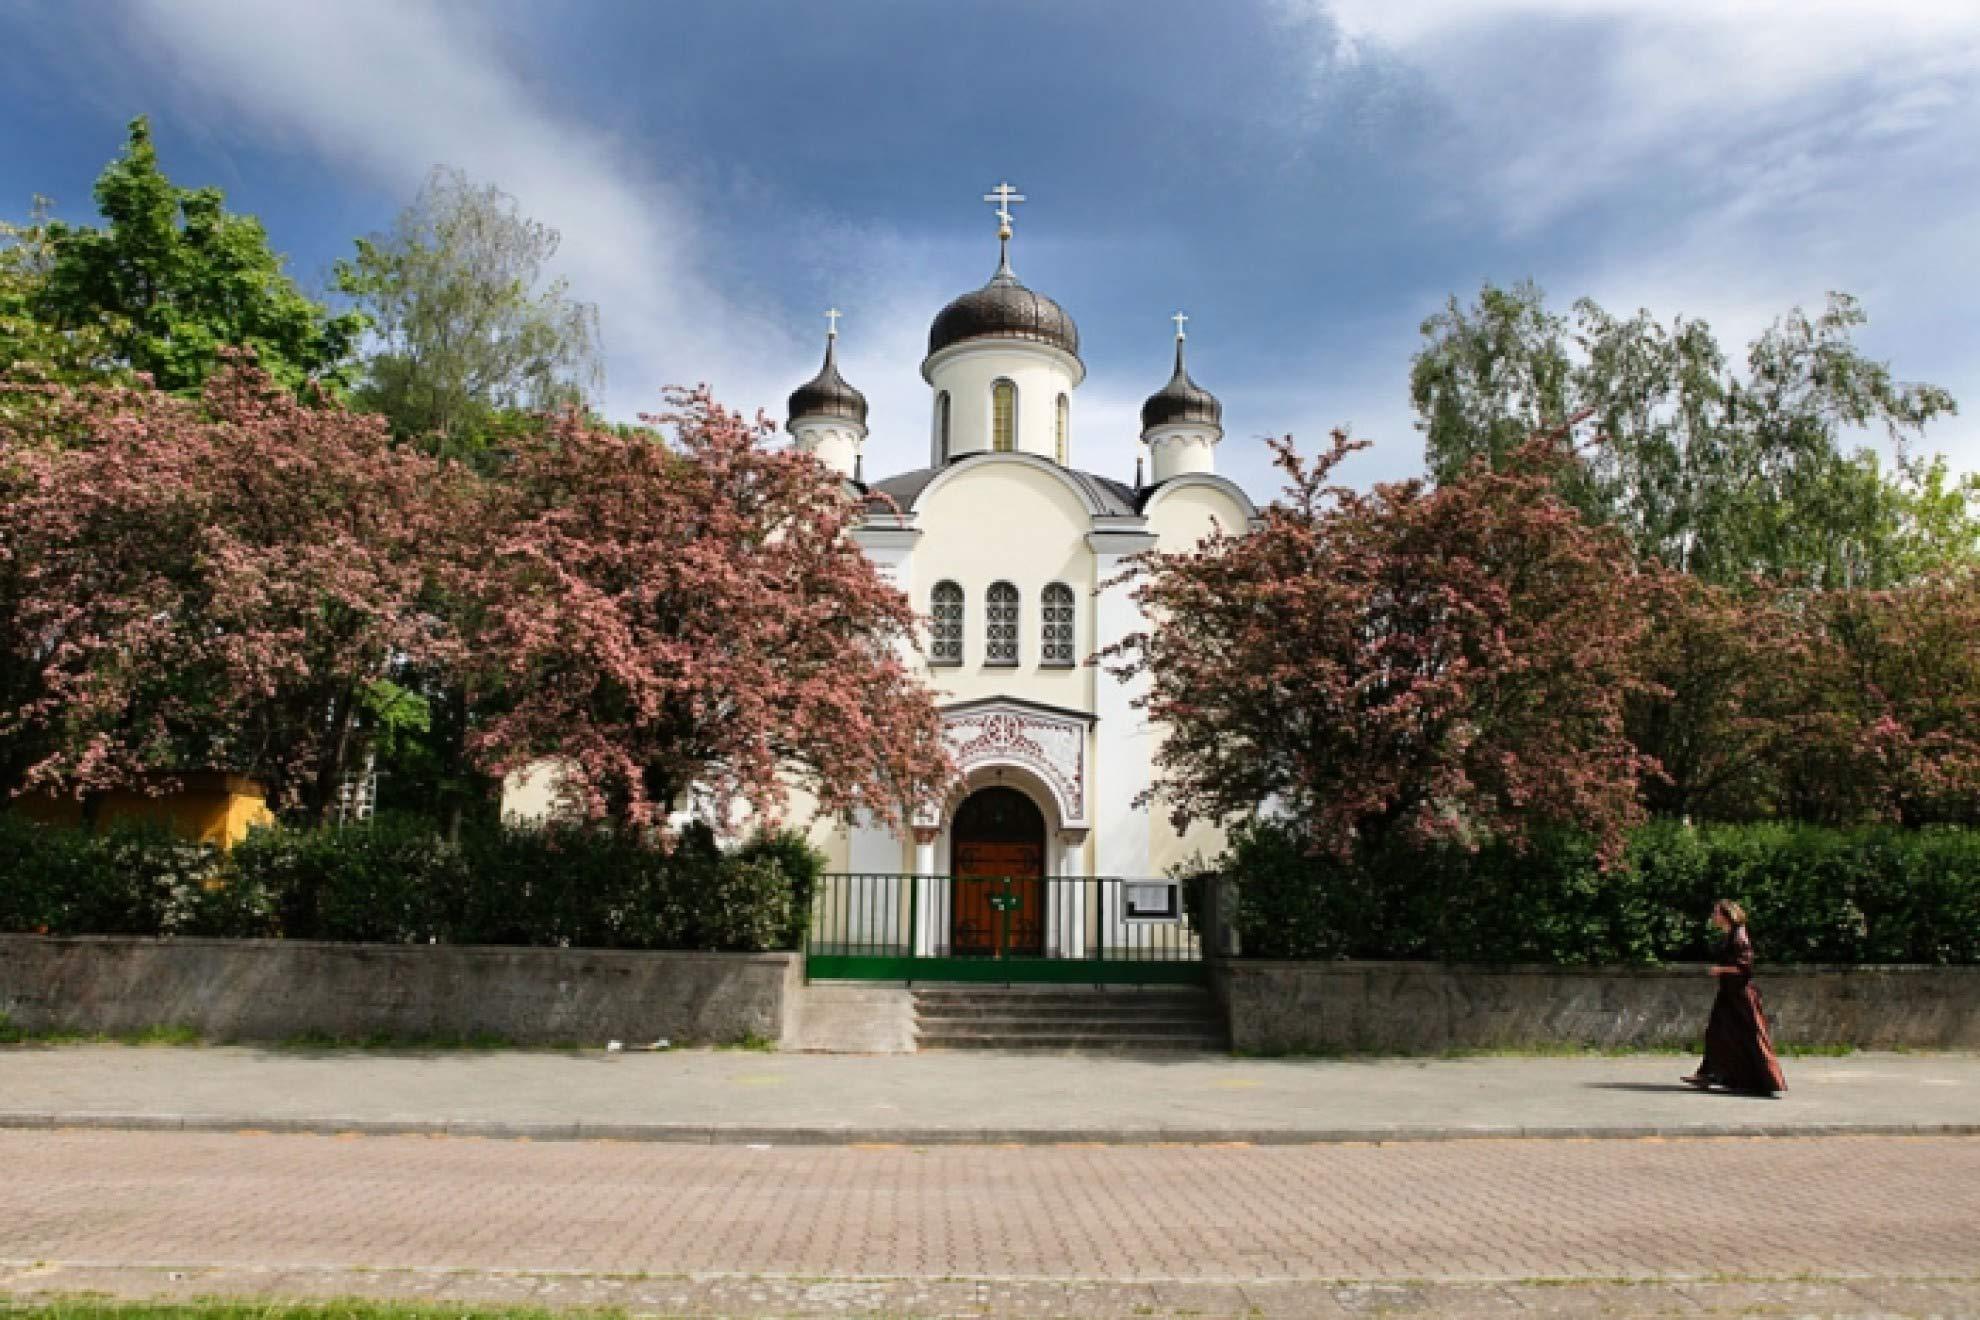 Kathedrale am Hohenzollerndamm